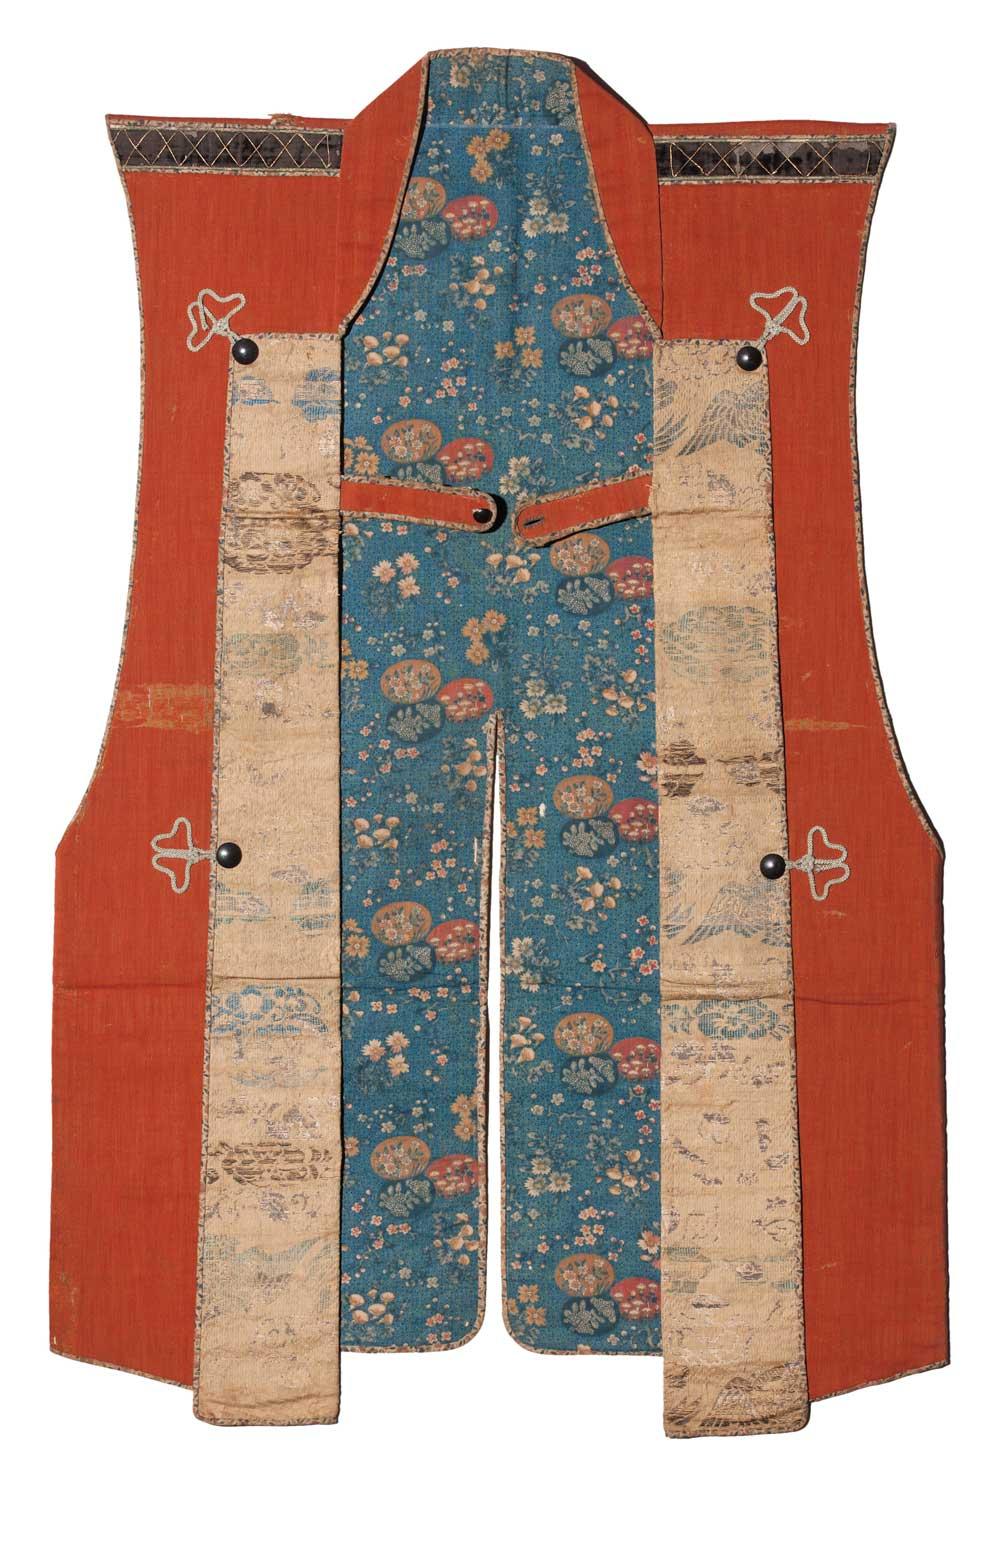 Surcoat [jinbaori], Art Gallery of South Australia, Adelaide